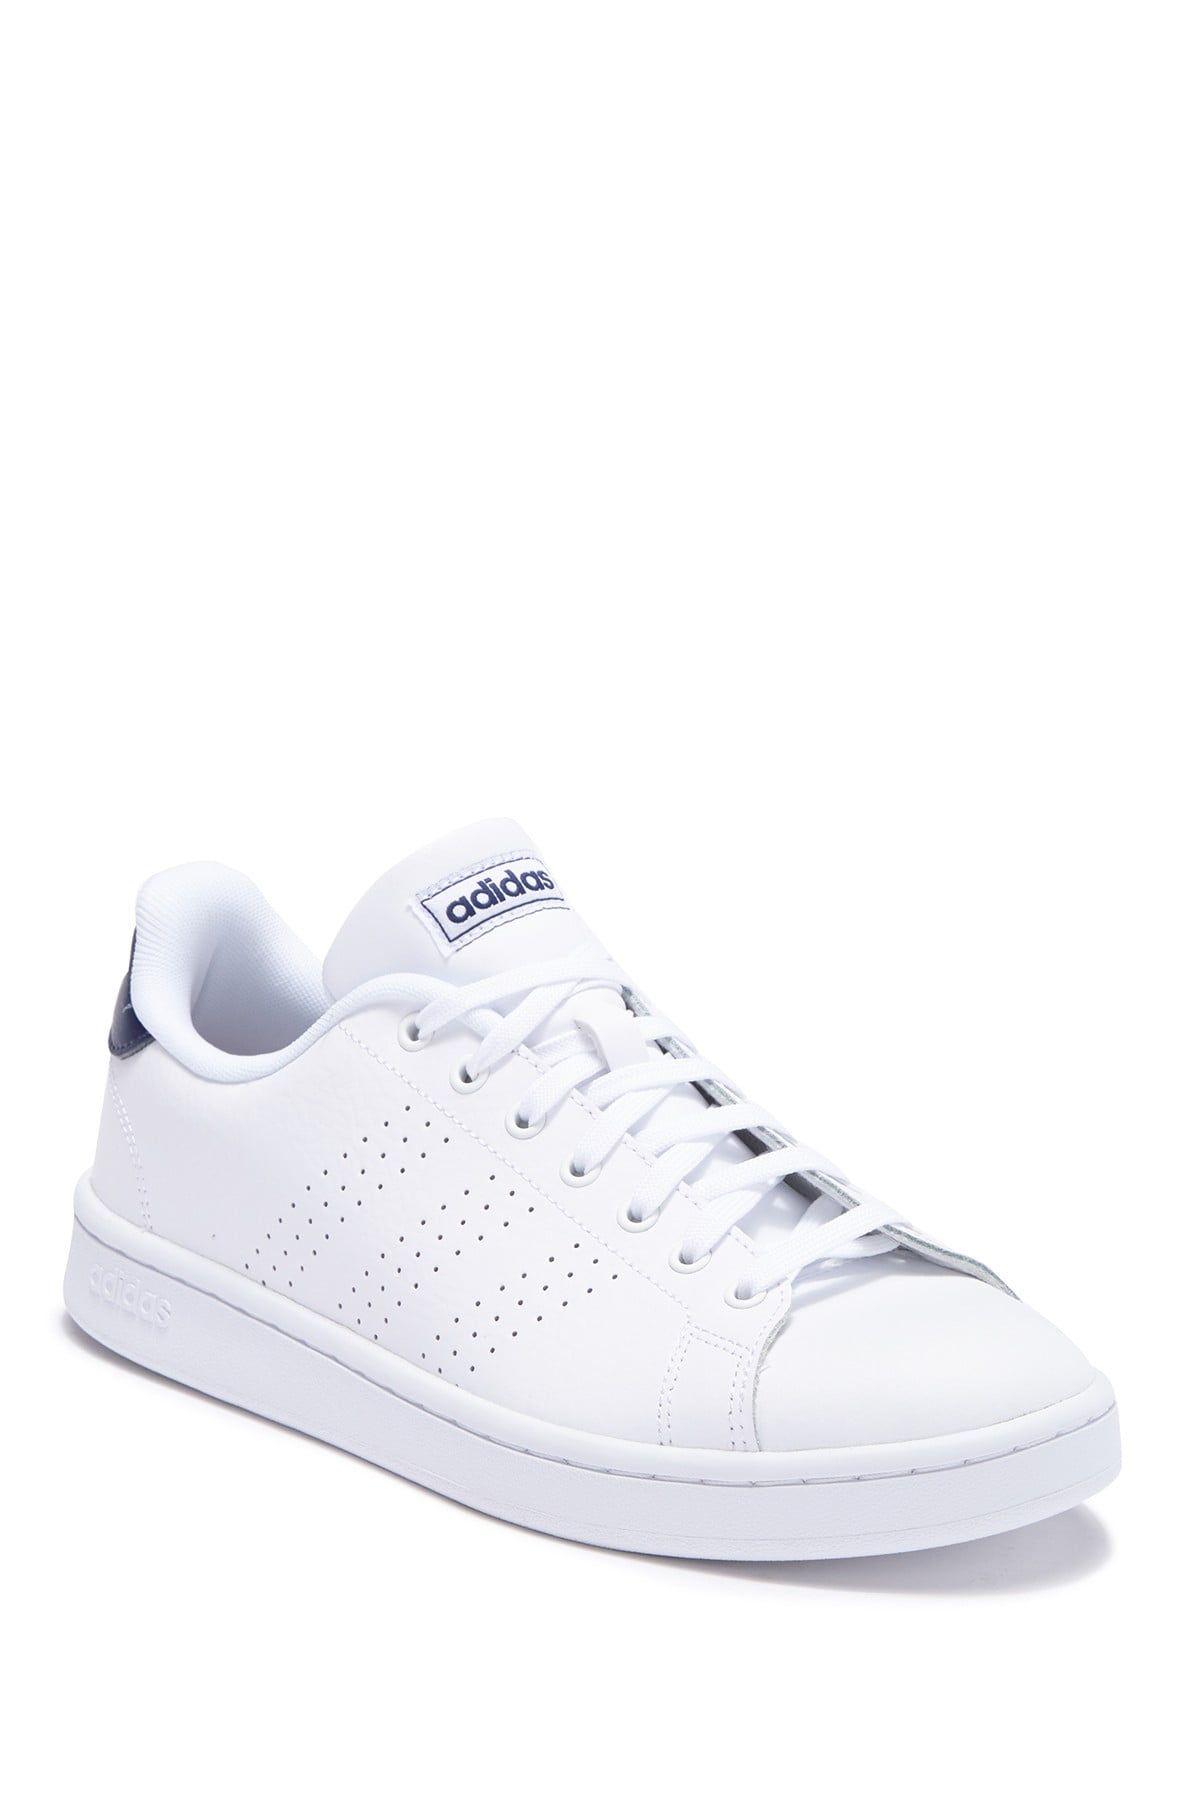 adidas advantage leather sneaker